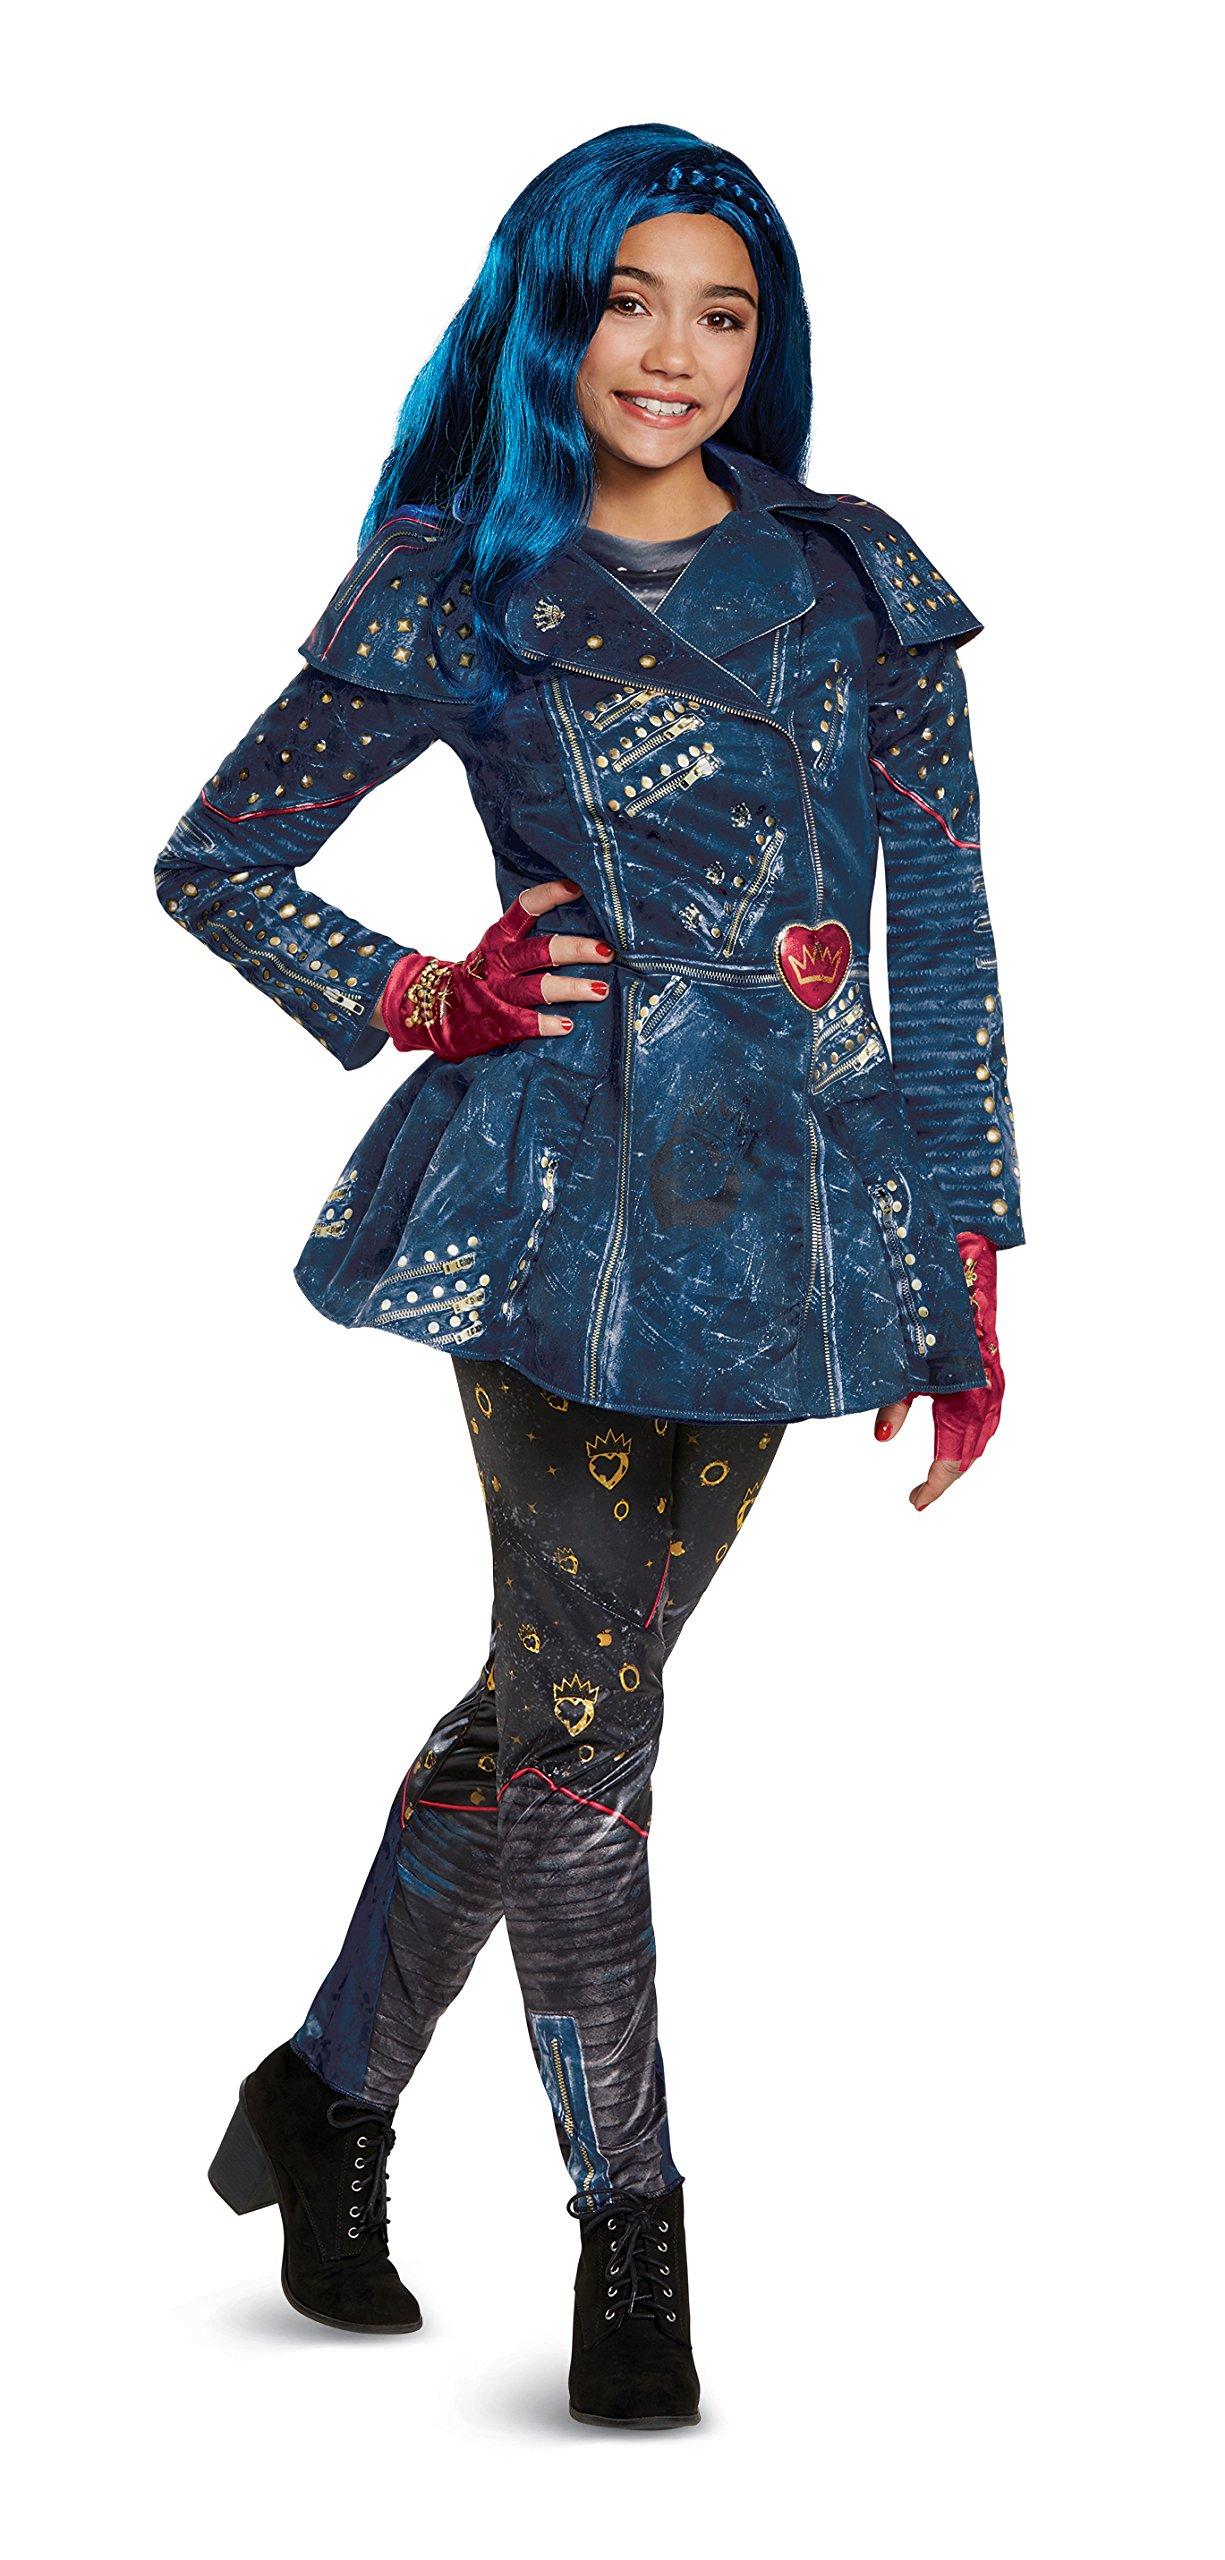 Disney Evie Deluxe Descendants 2 Costume, Blue, Large (10-12)